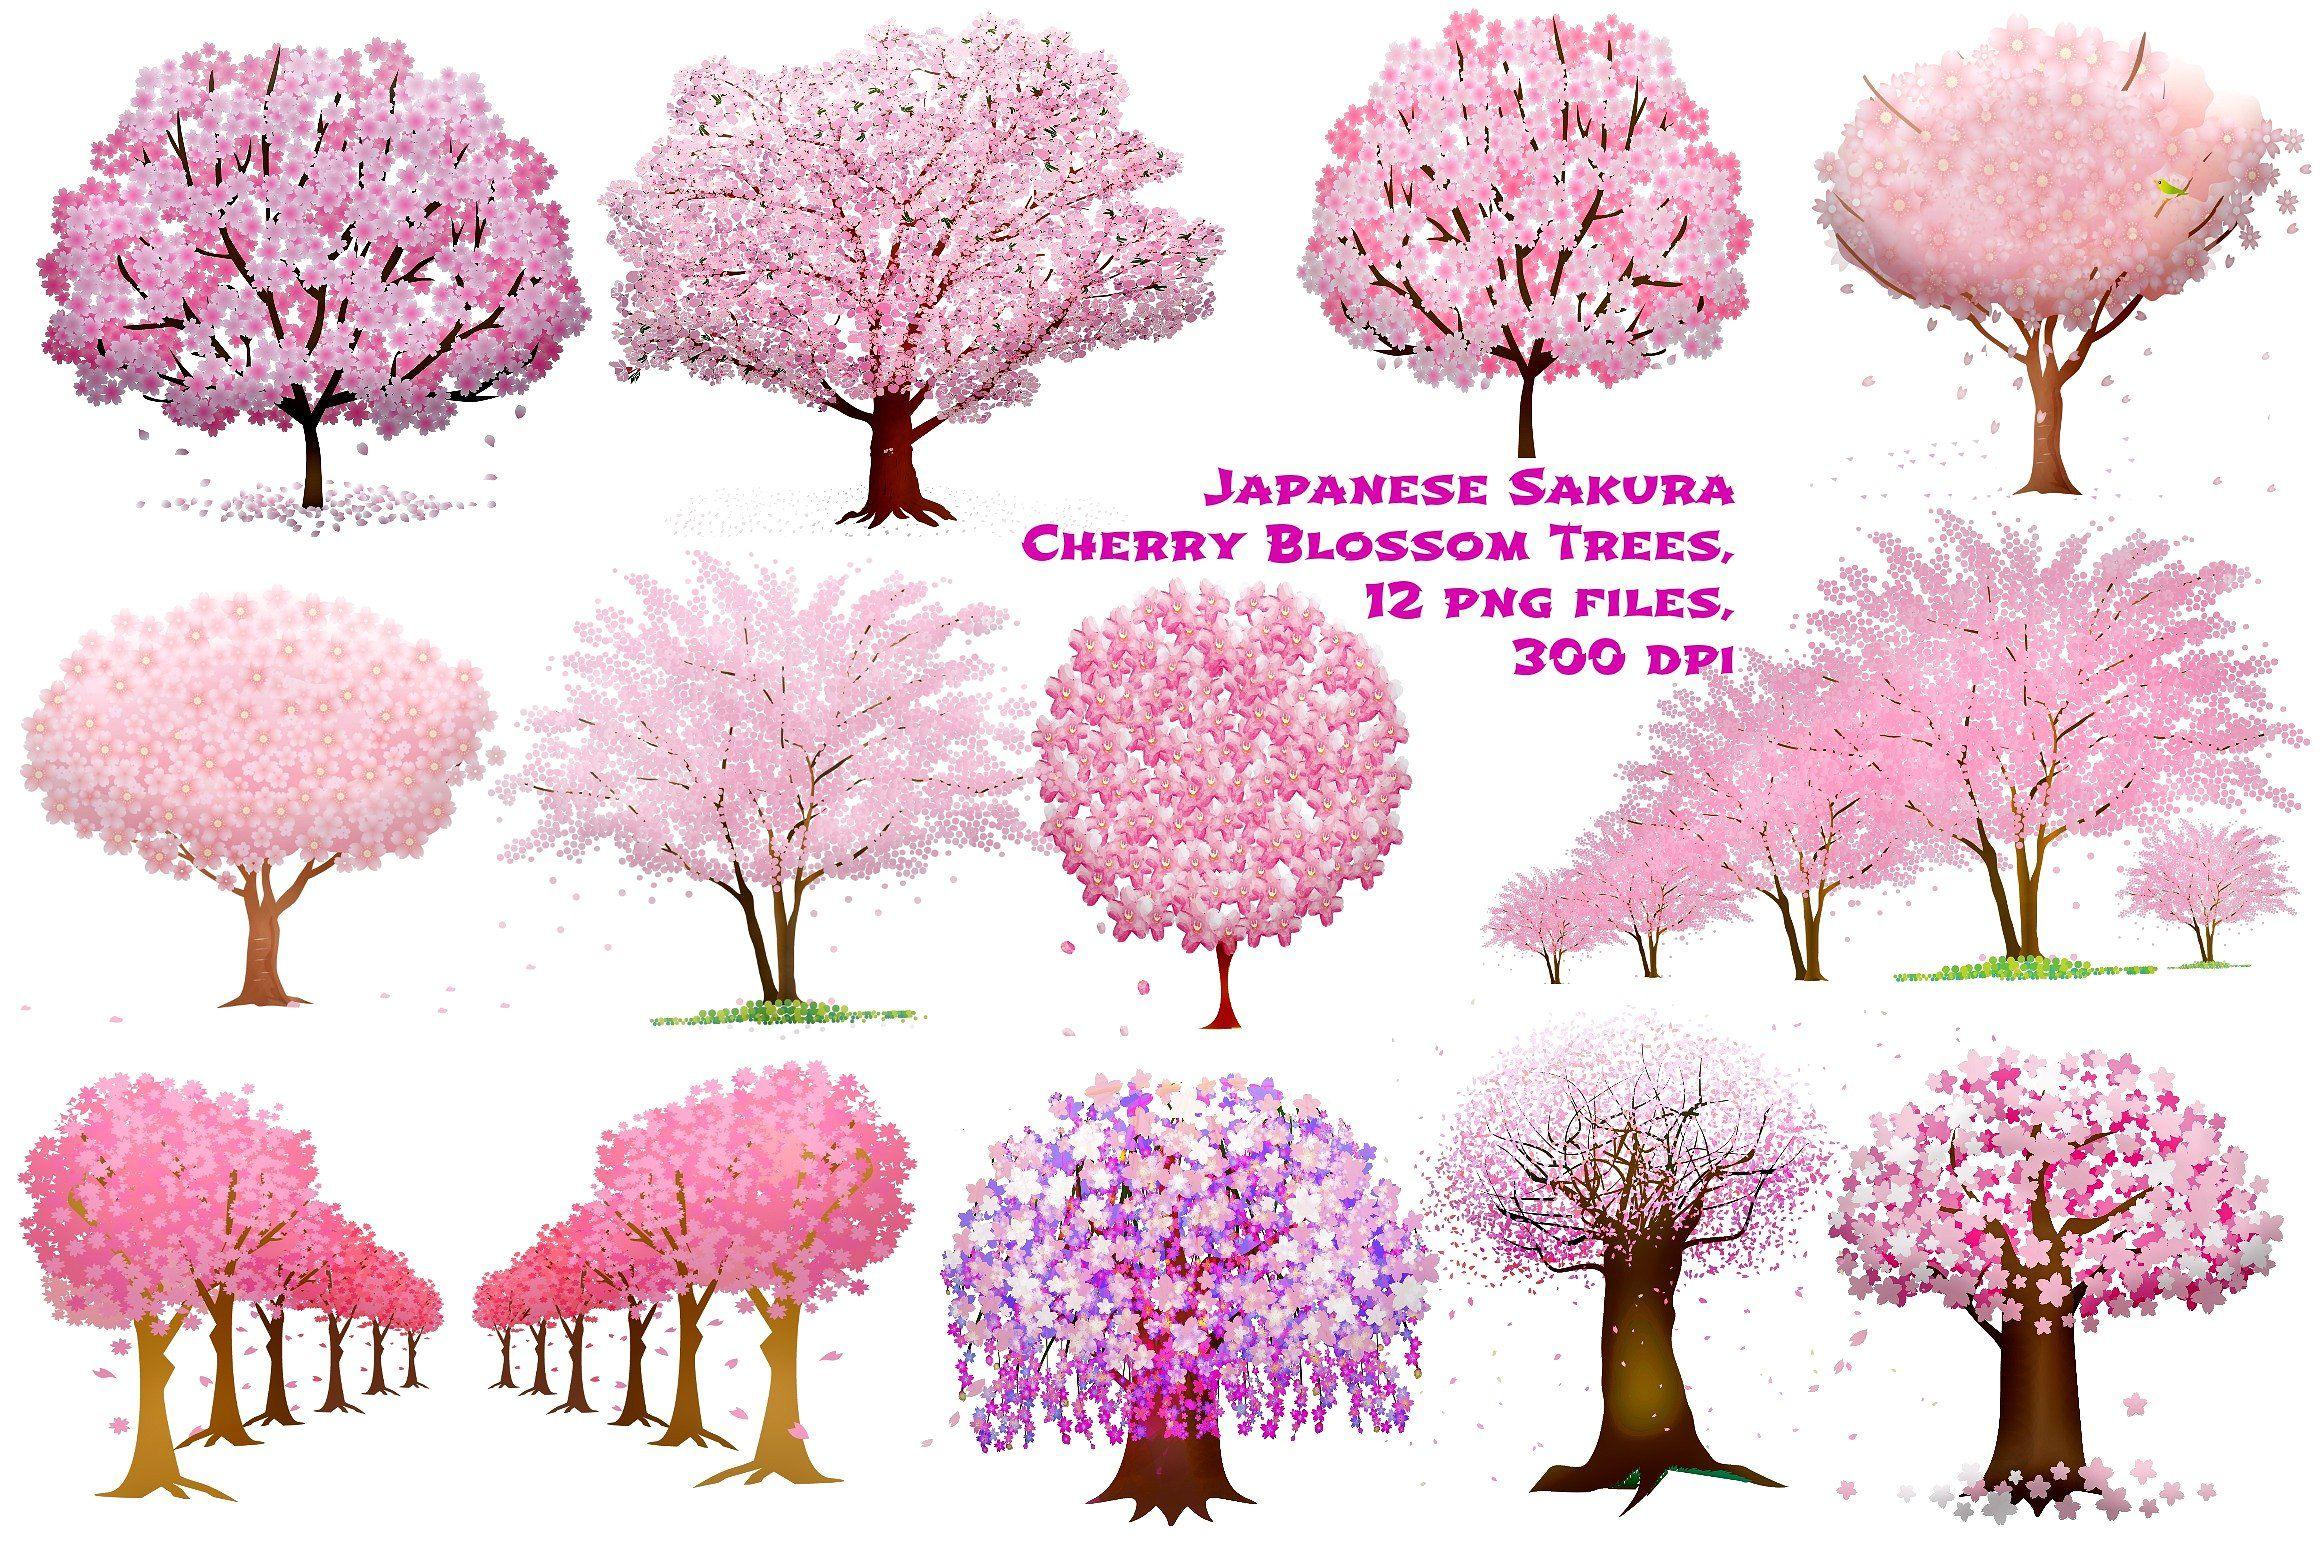 Cherry Blossom Sakura Trees Paper Invitations Announcements Printed Cherry Blossom Tree Tattoo Cherry Blossom Painting Cherry Blossom Drawing